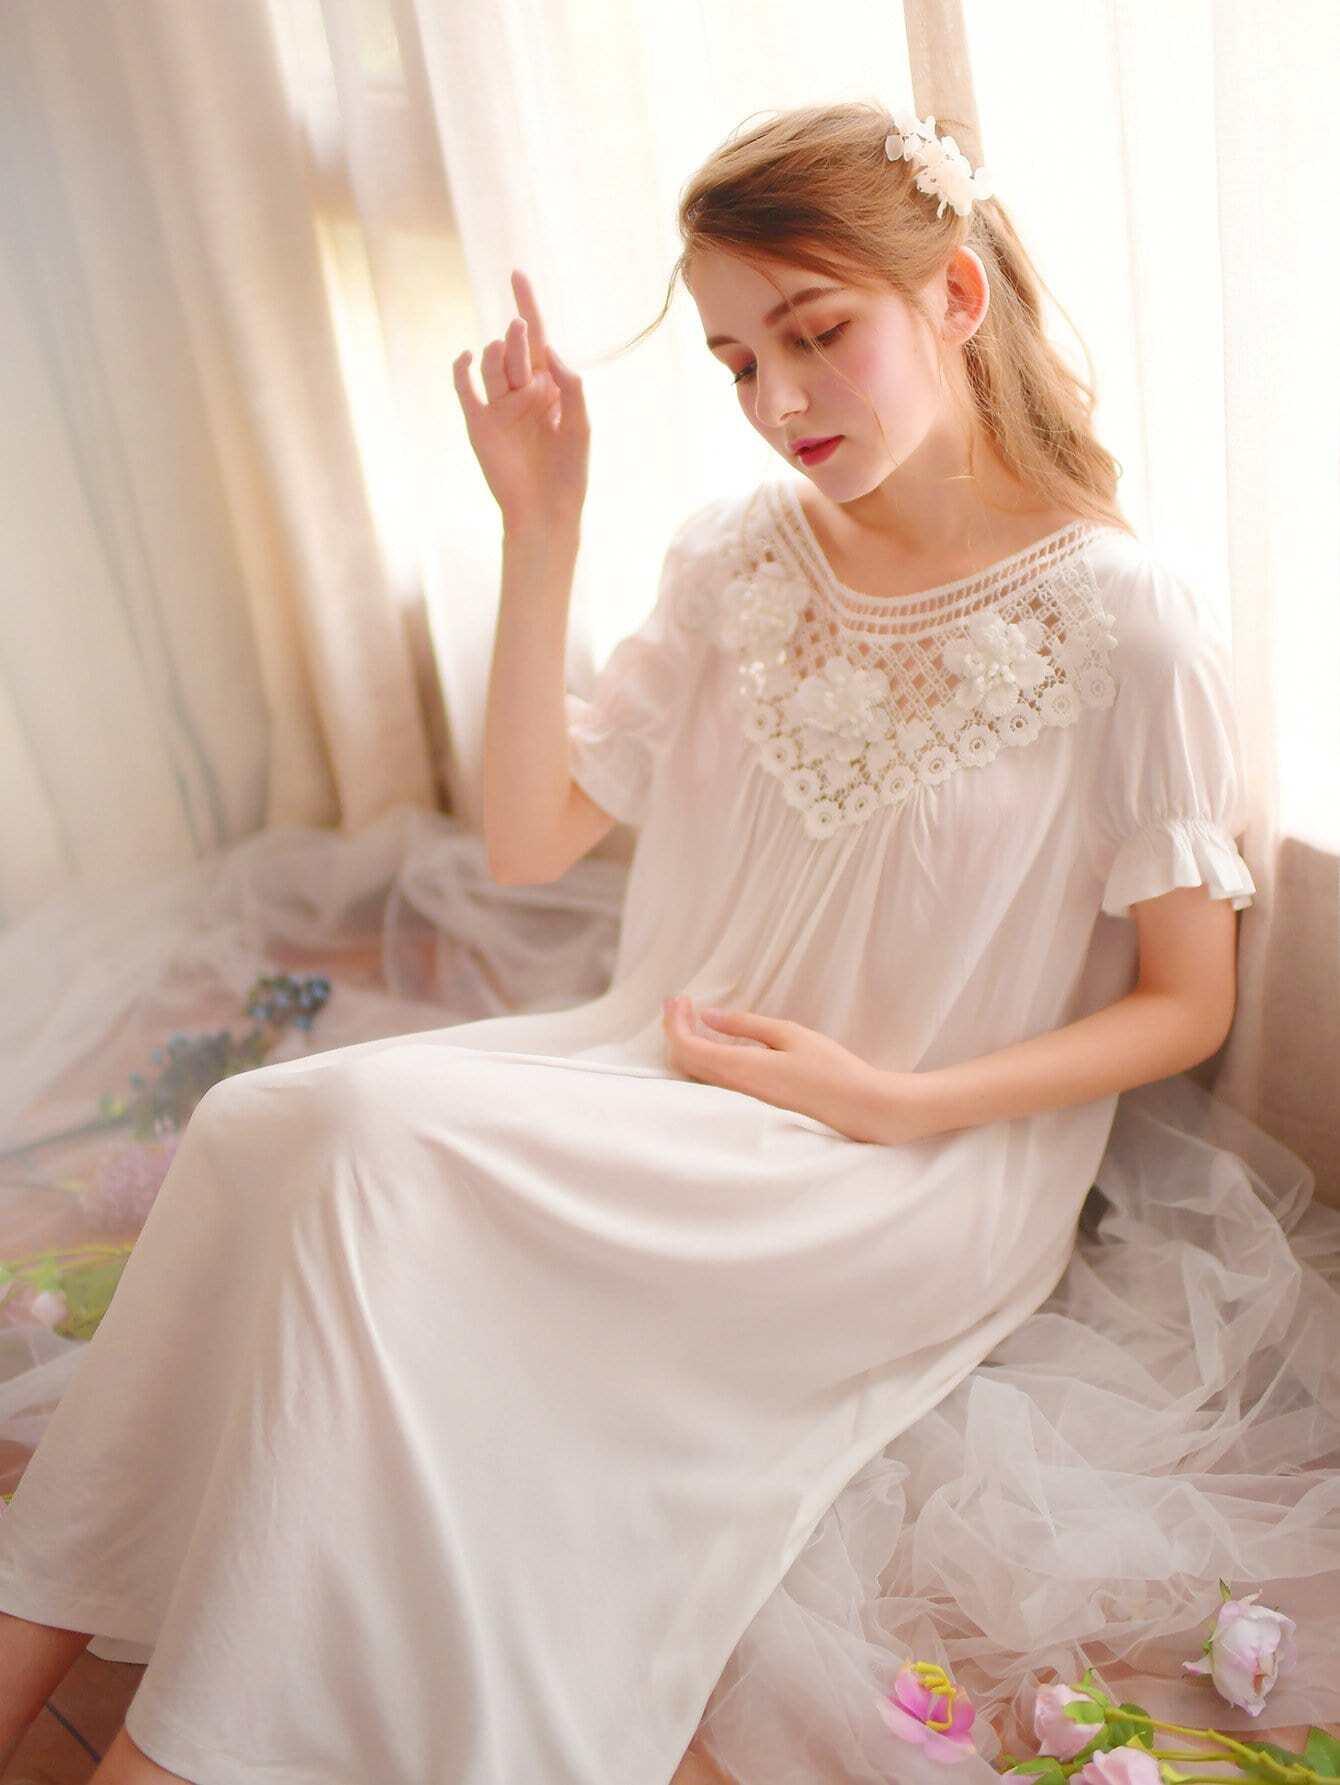 Cut Out Crochet Applique Night Dress mesh see through cut out crochet tights